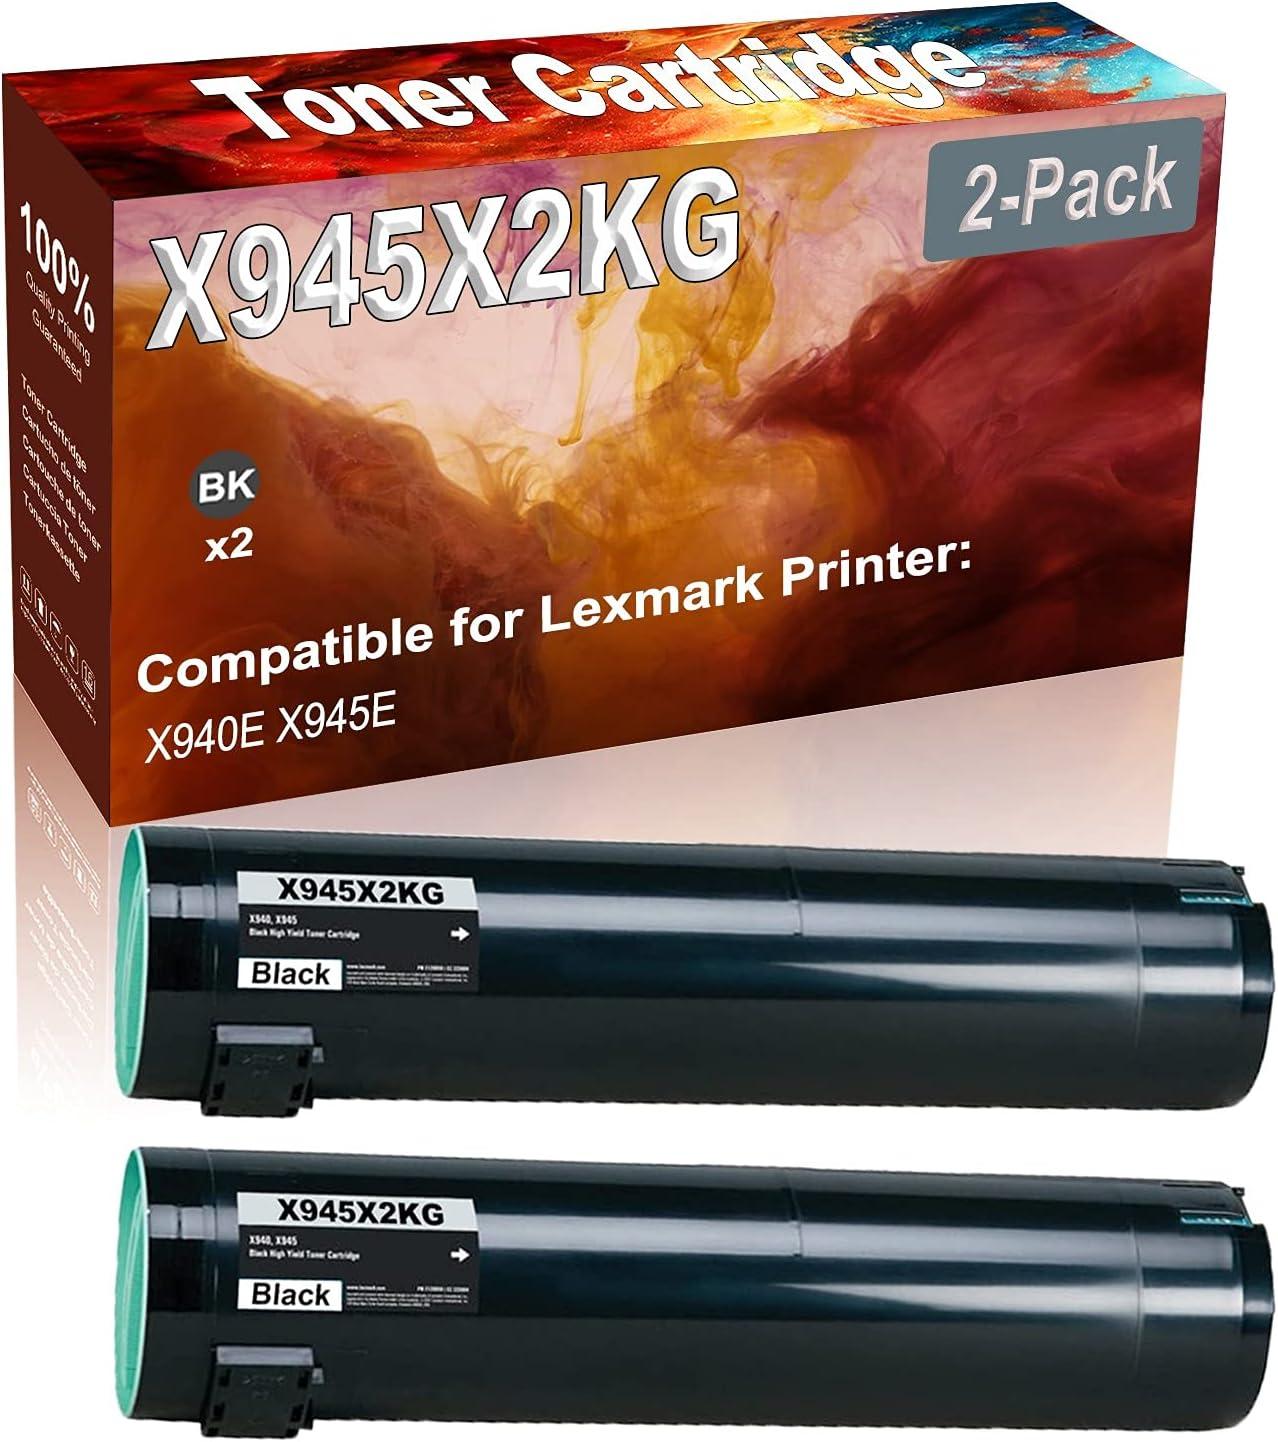 2-Pack (Black) Compatible High Yield X945X2KG Printer Toner Cartridge use for Lexmark X940E X945E Printers